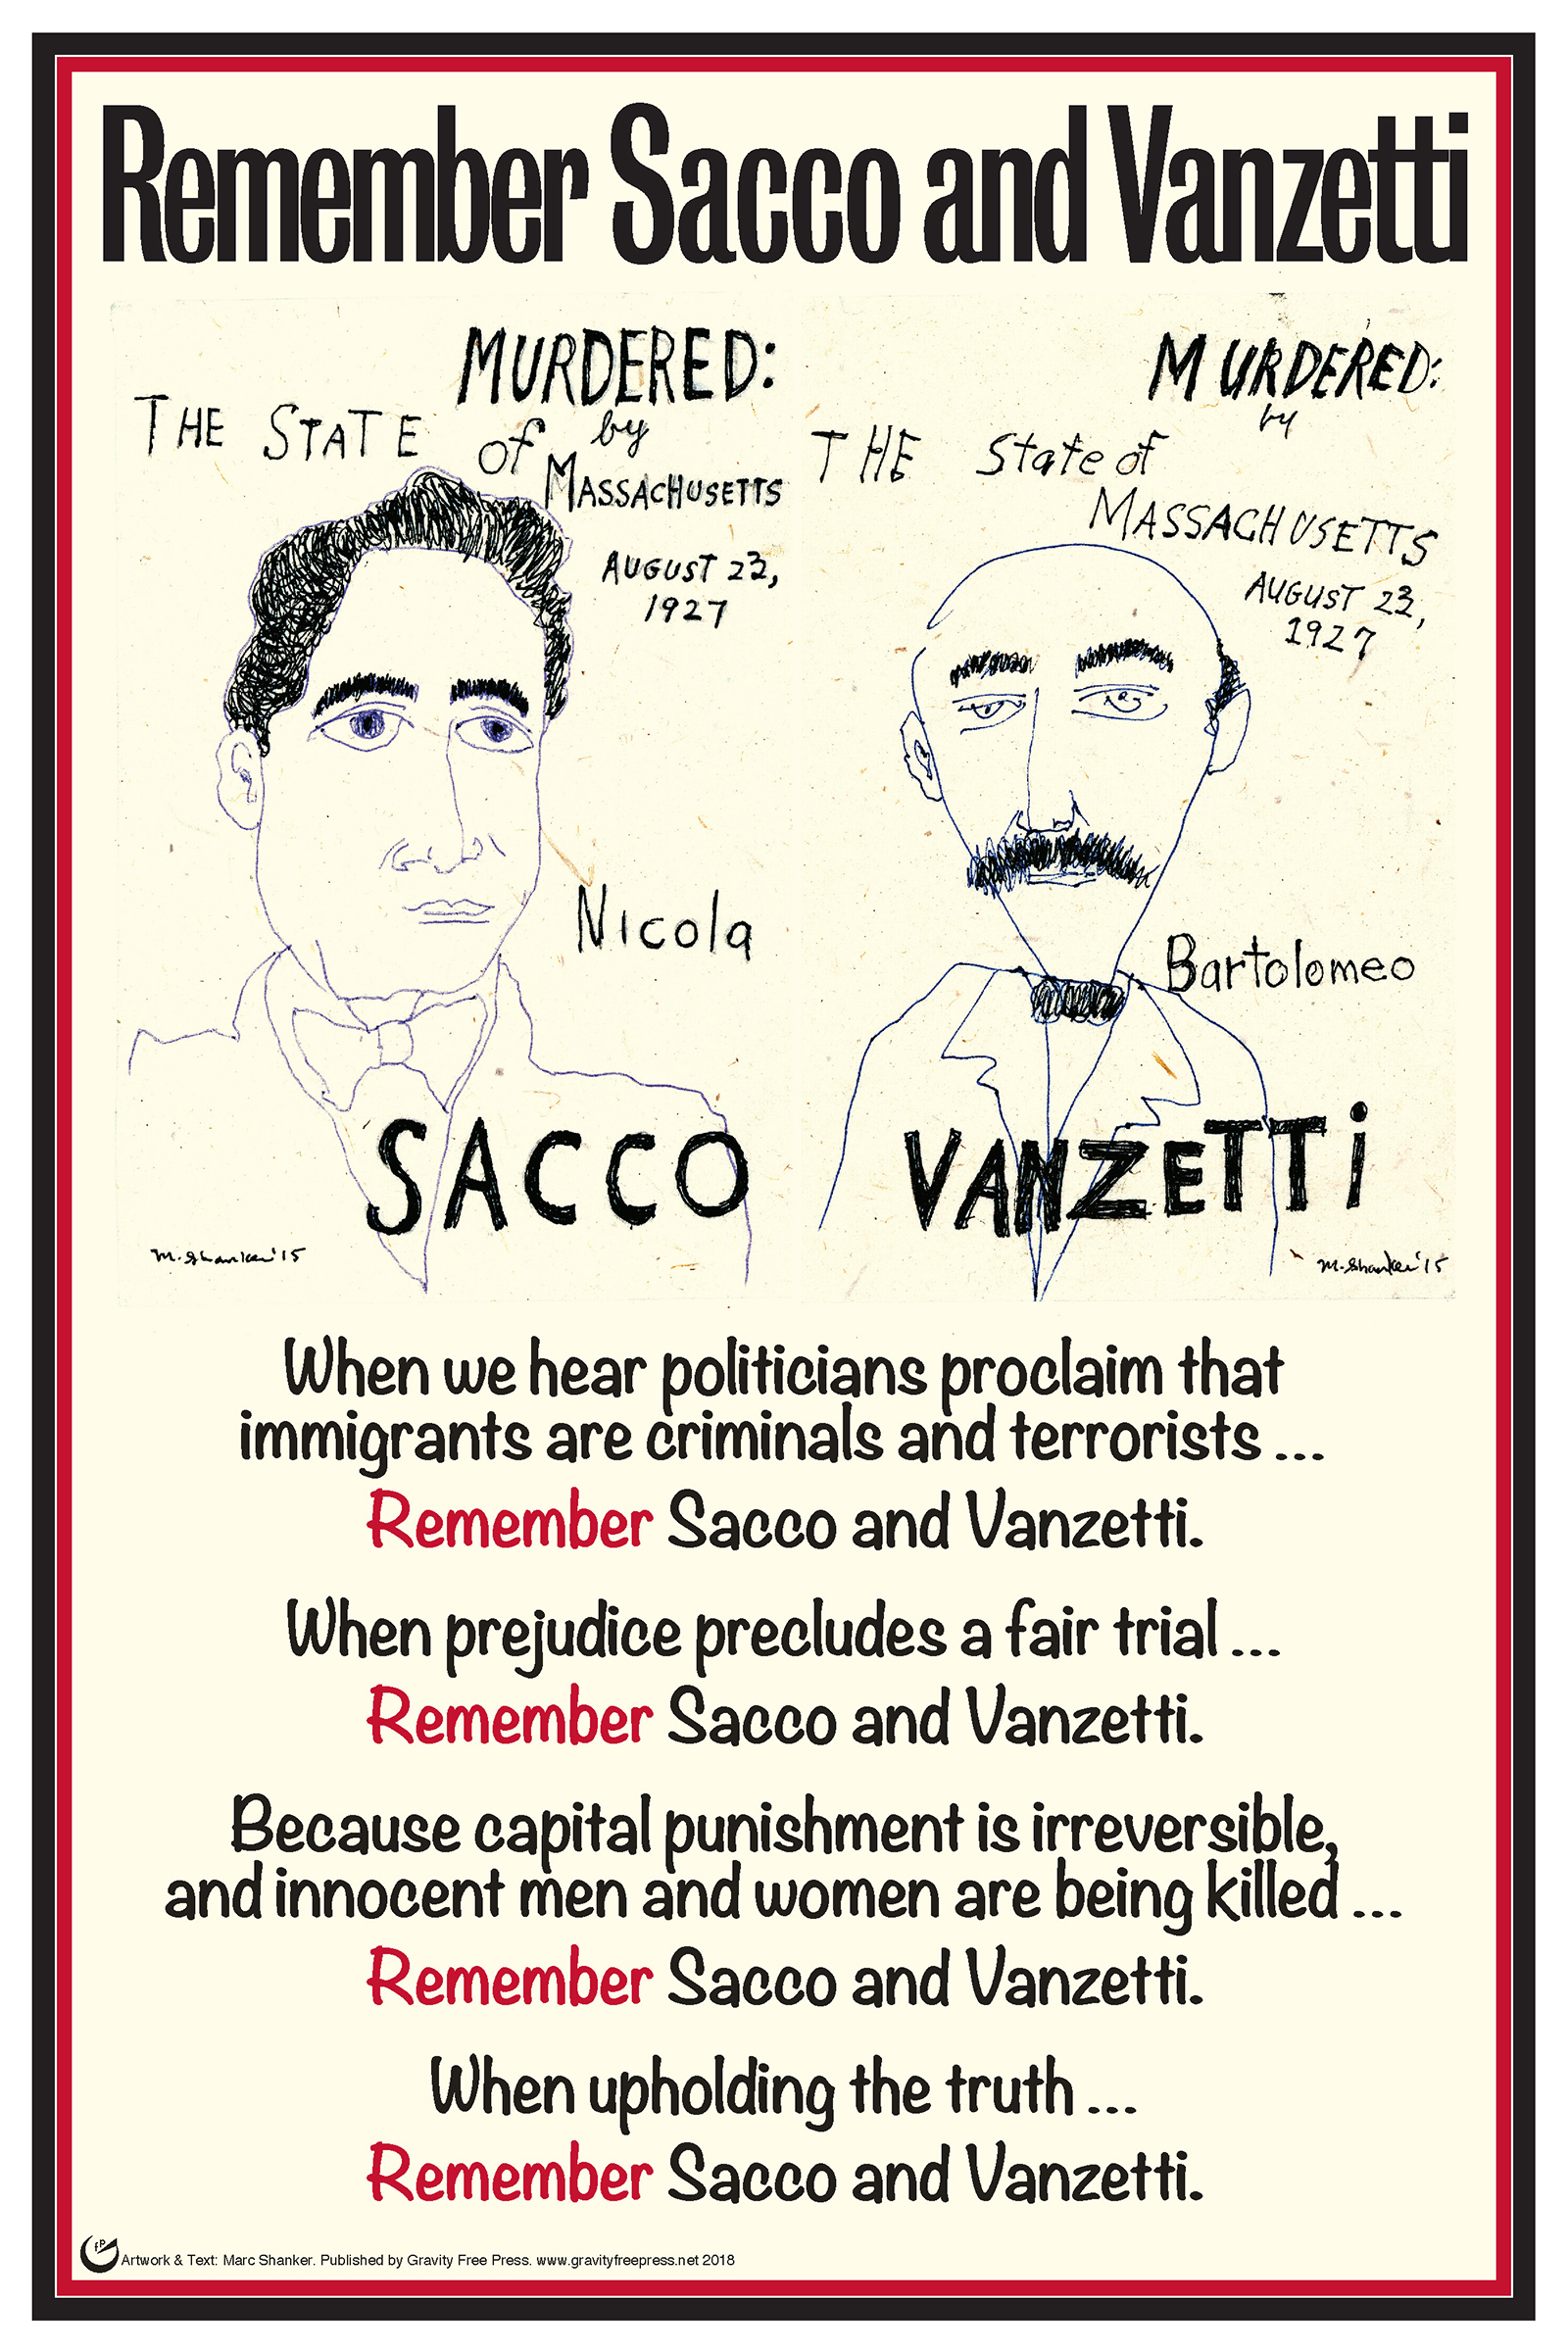 sacco and vanzetti poster